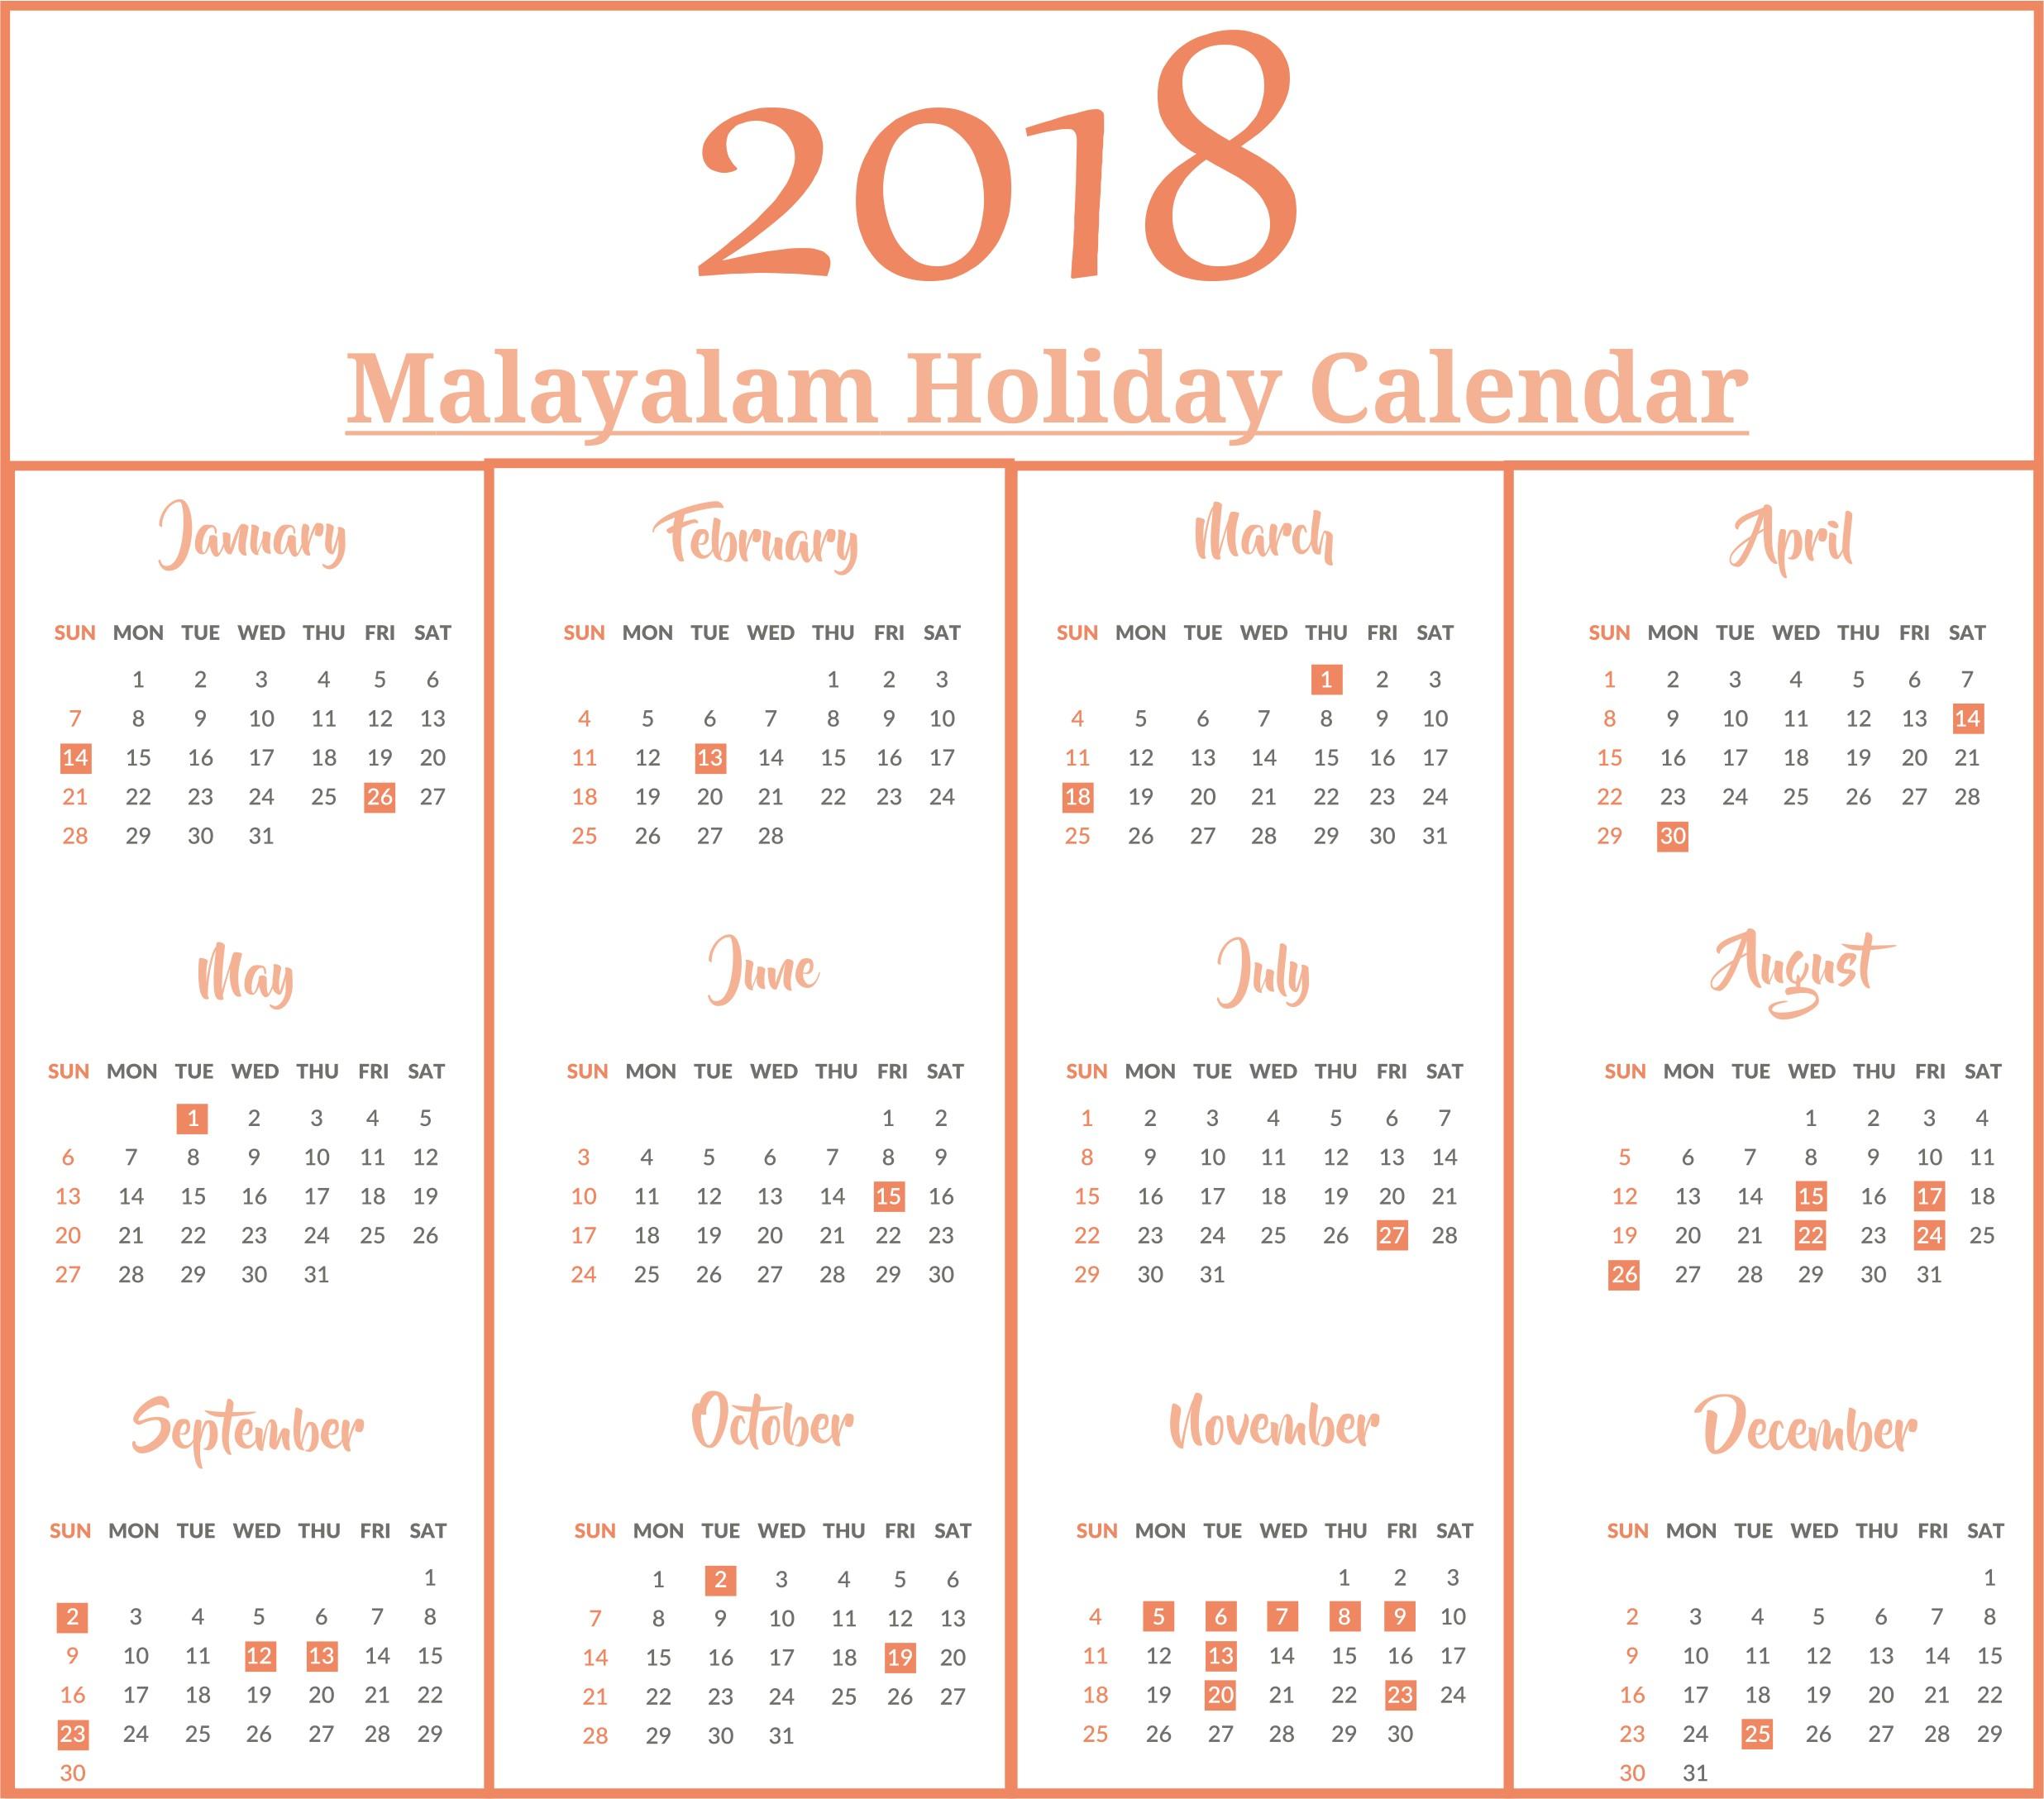 Malayalam Calendar 2019 Free Download Más Recientemente Liberado Malayalam Calendar 2018 with Malayalam Holidays Of Malayalam Calendar 2019 Free Download Más Populares Test & Zertifizierung Ehedg